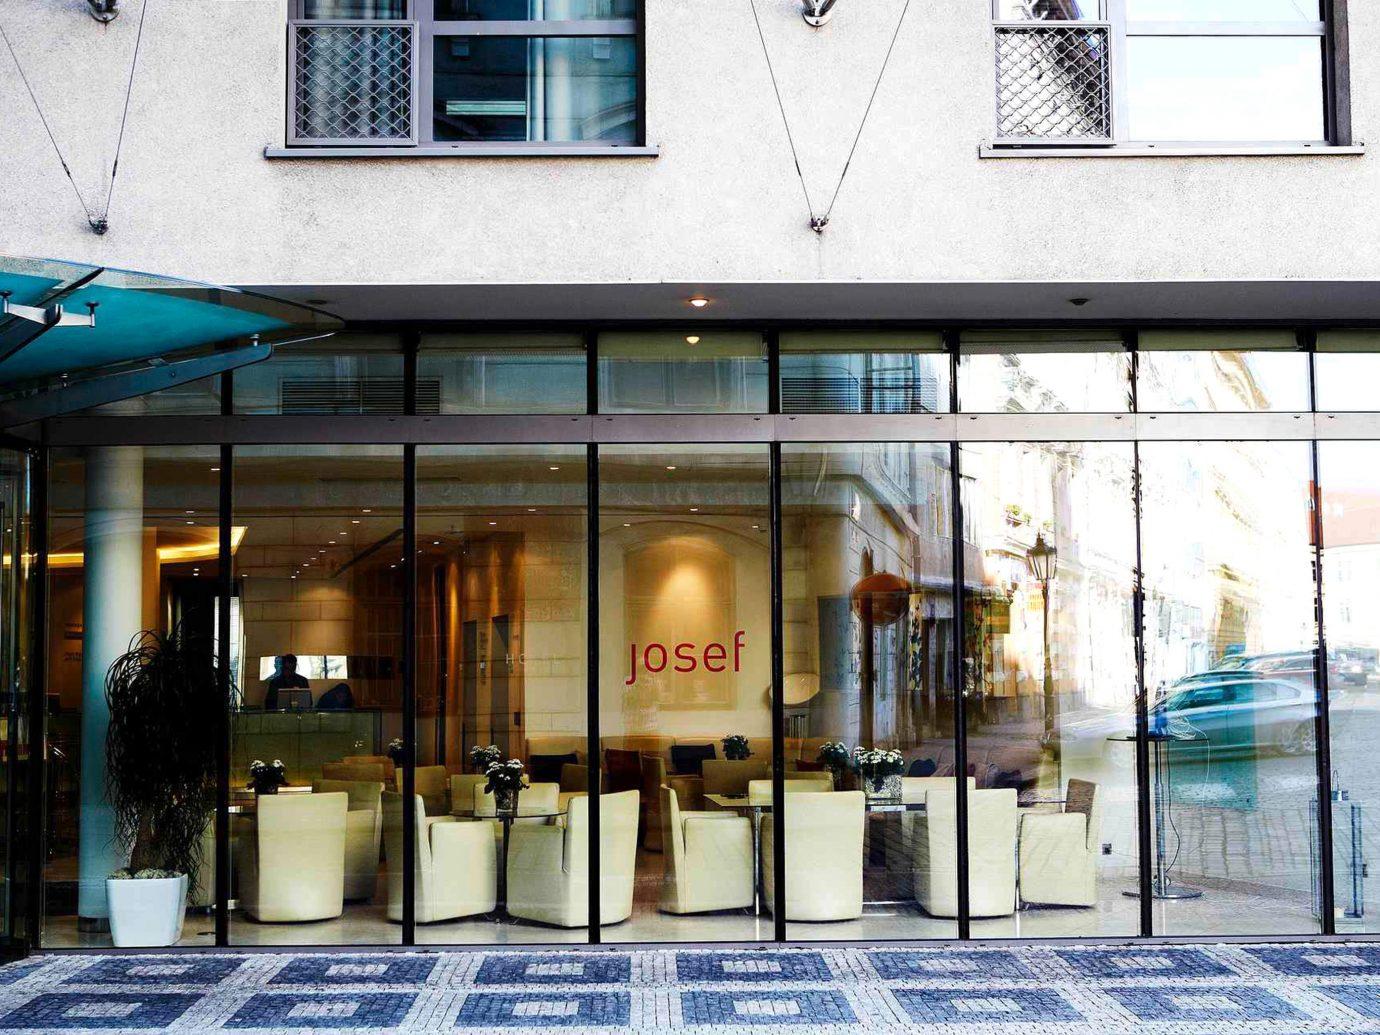 Bar Dining Drink Eat europe Hotels Modern Prague building Architecture facade interior design Design retail